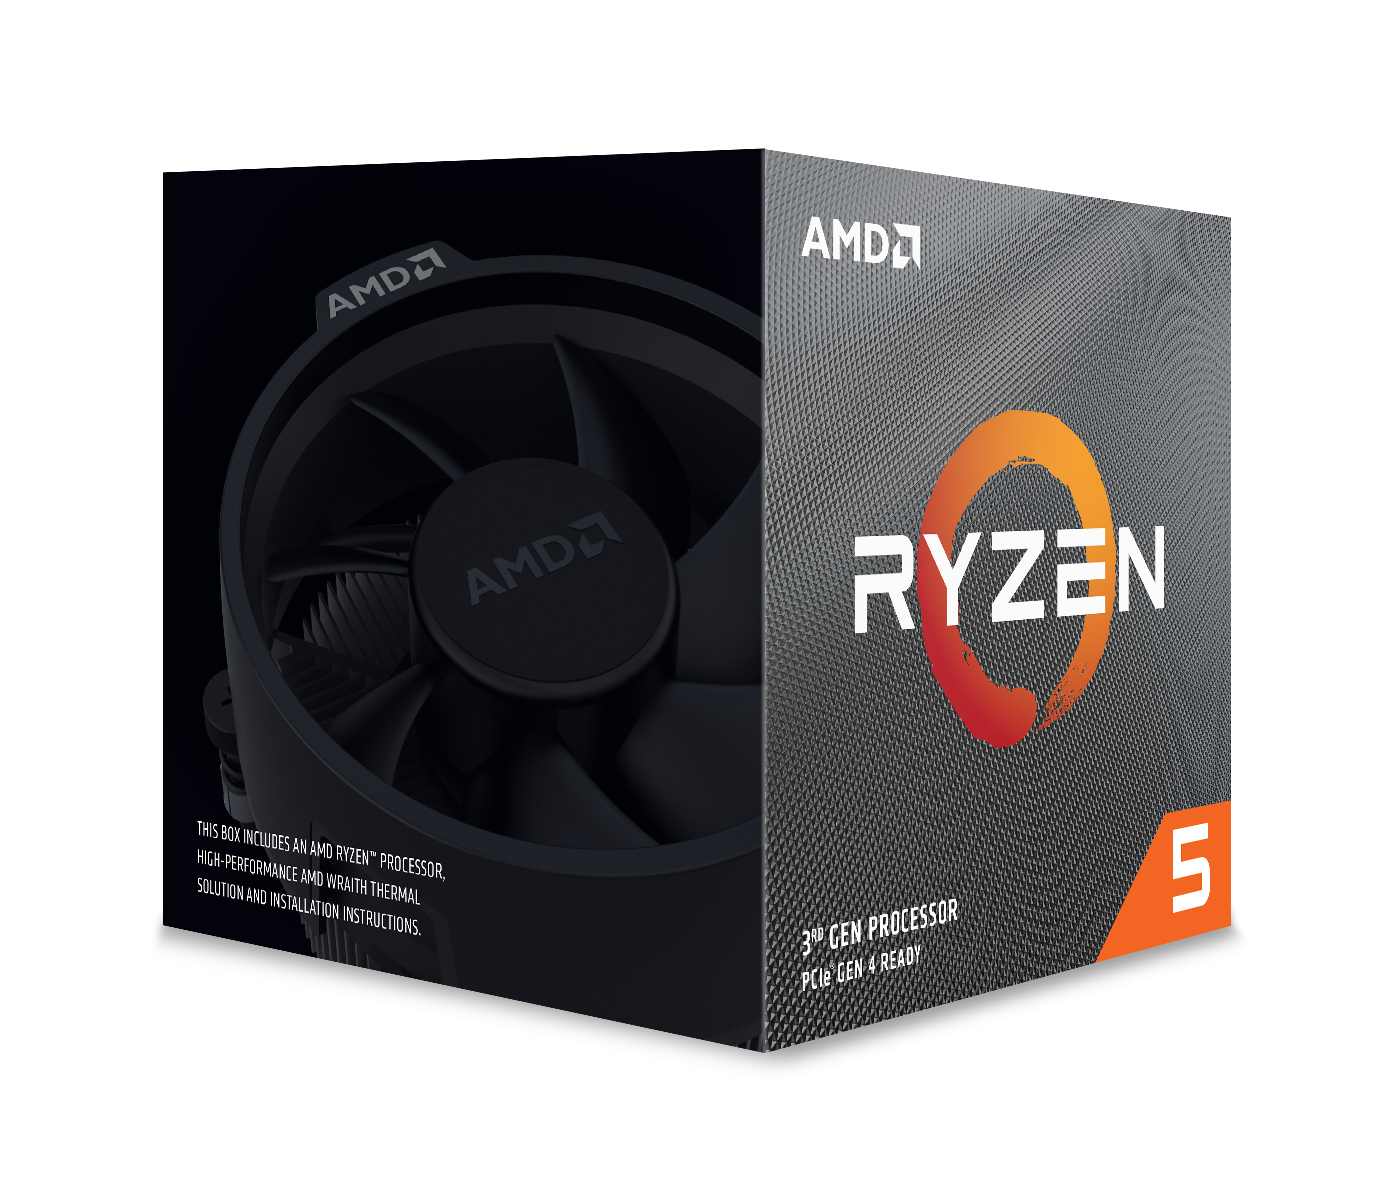 Processeur Ryzen 5 3600 Wraith Stealth Edition AMD